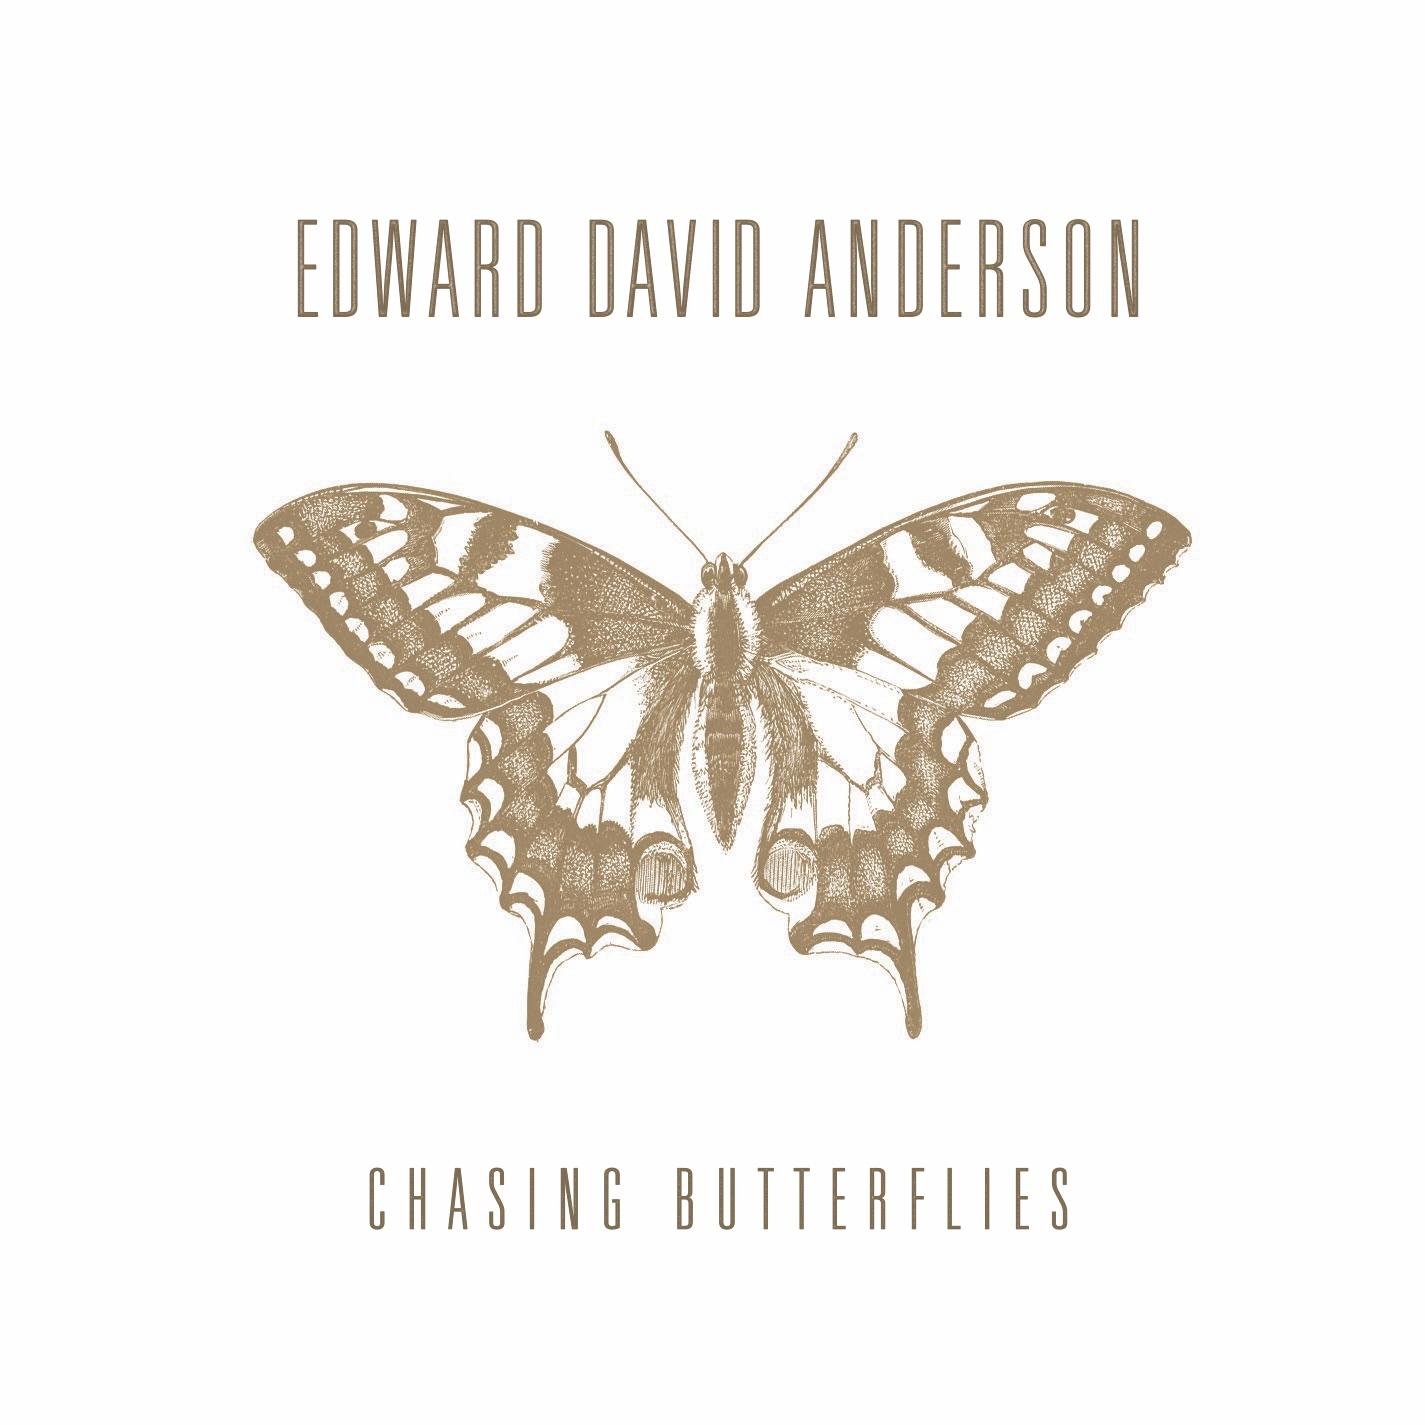 eda-butterfly-cover-2cd-cover (1).jpg